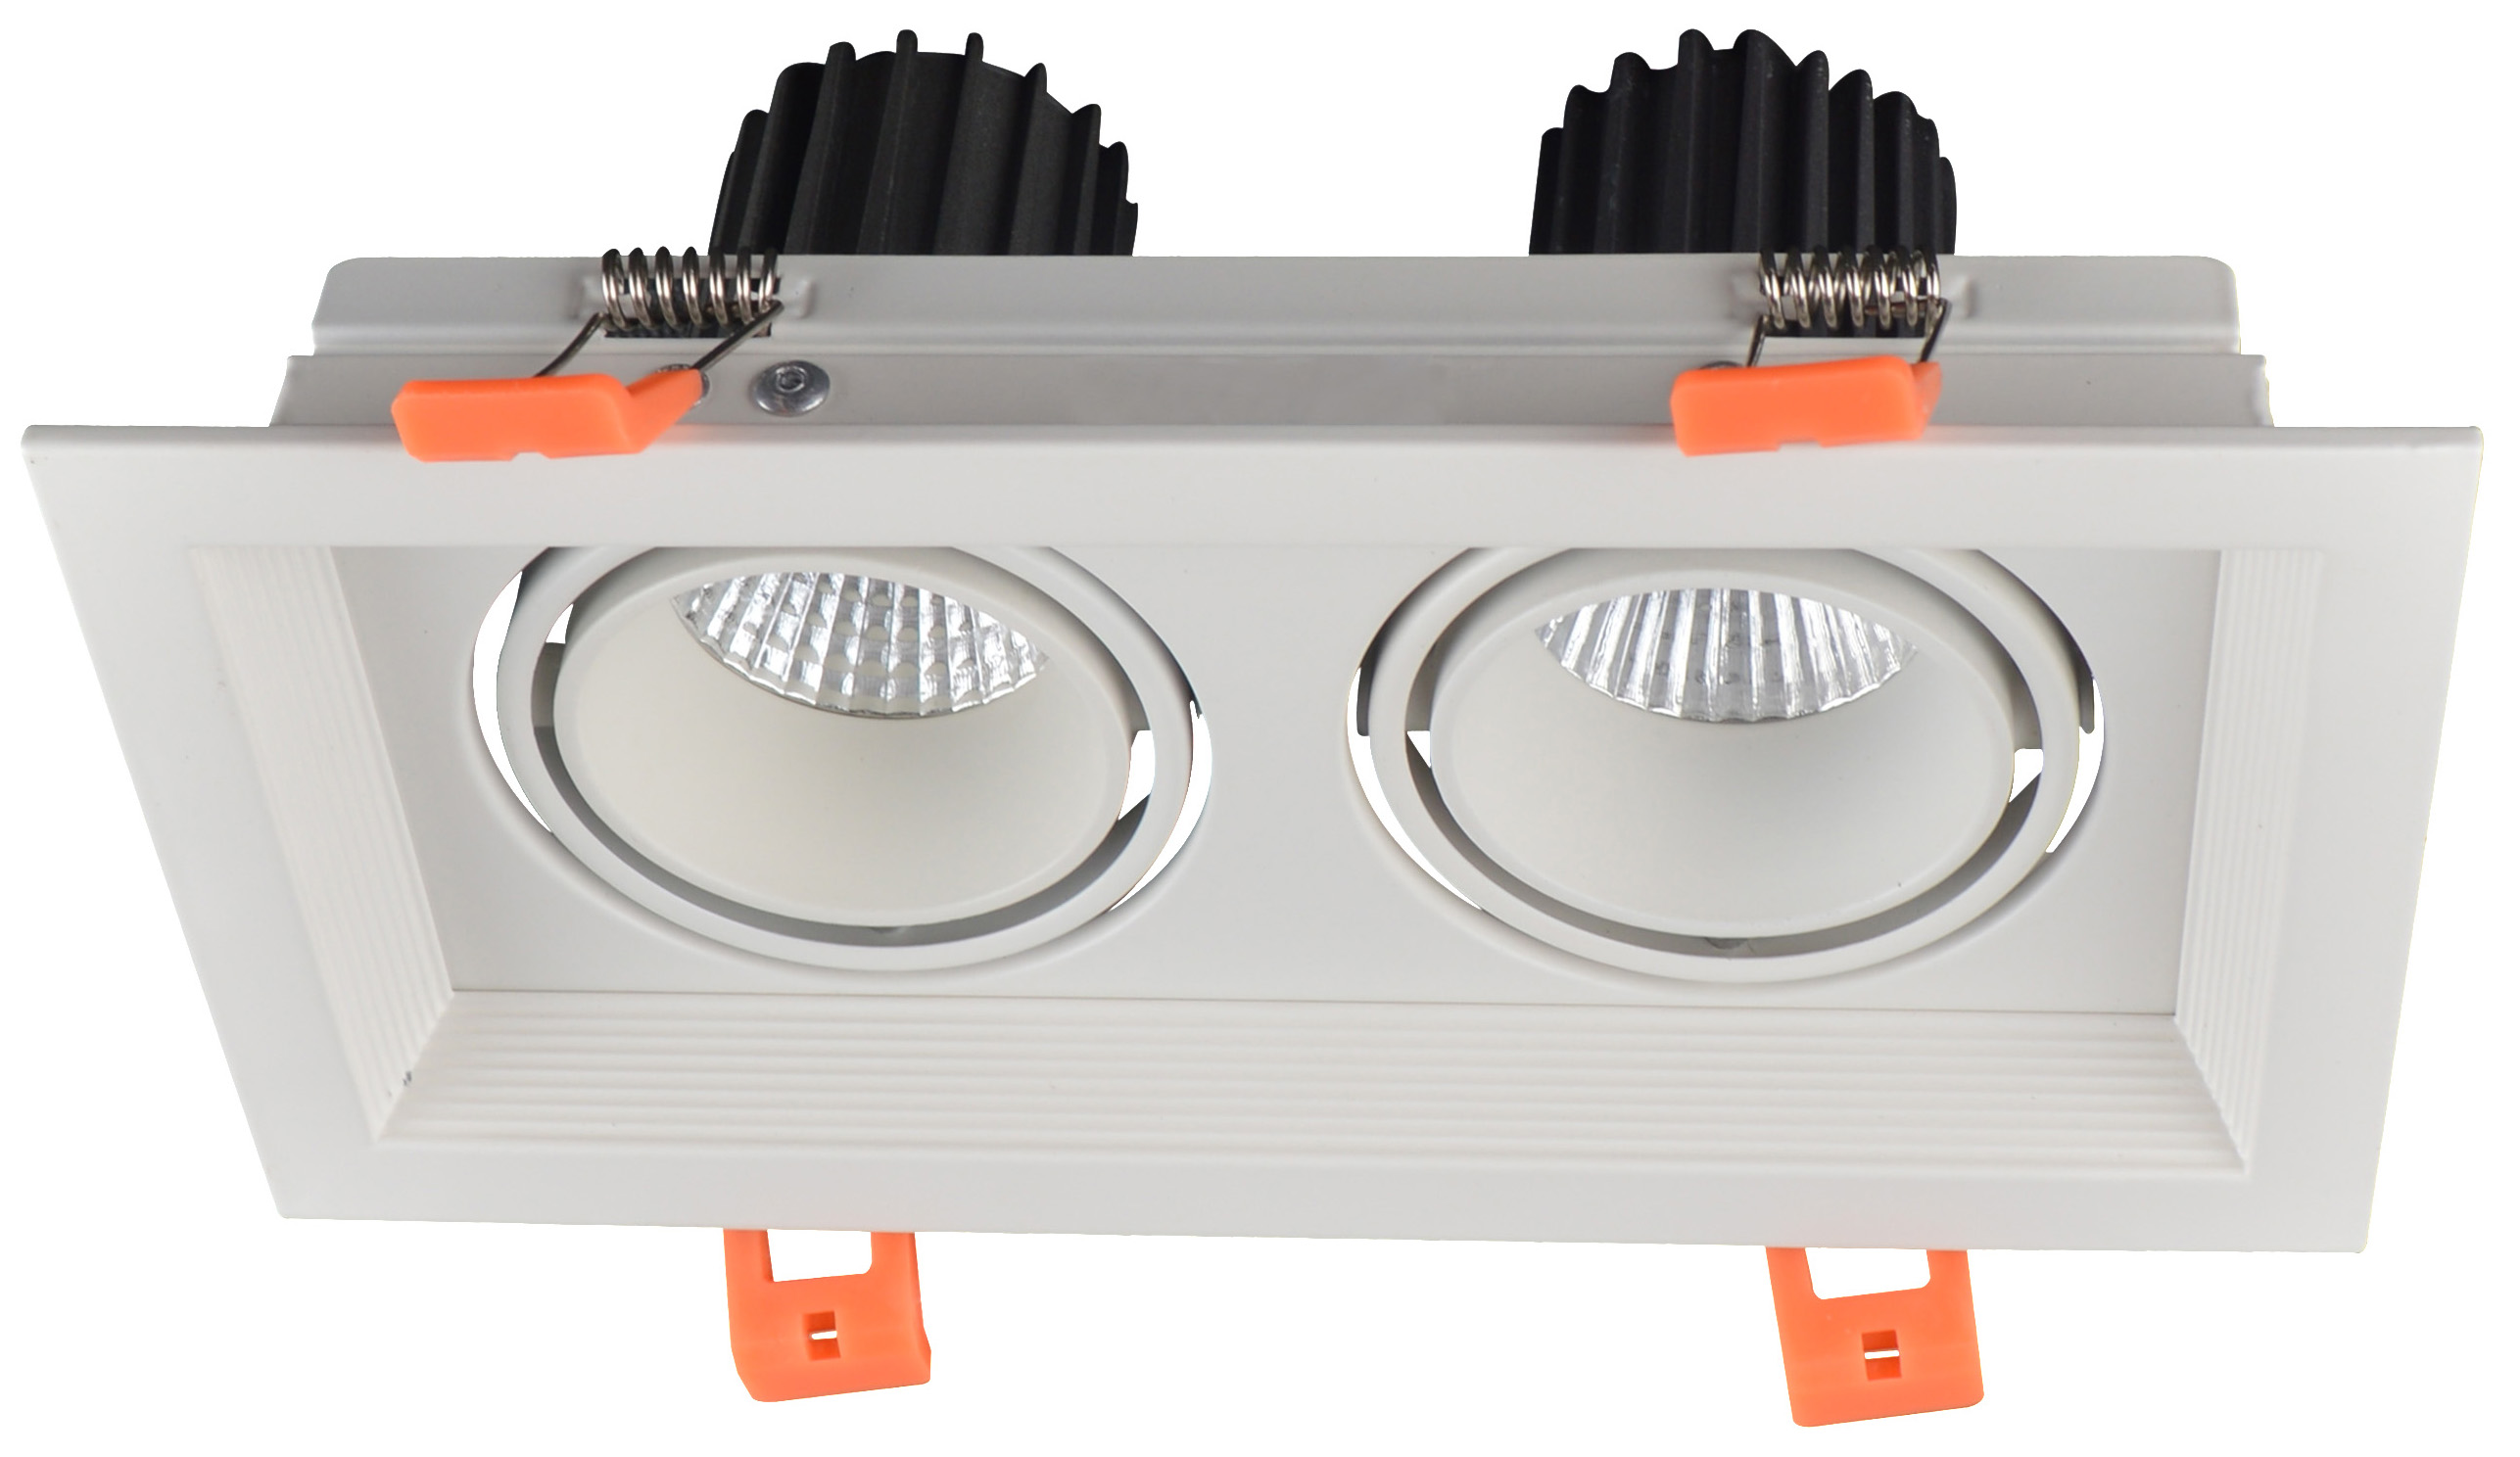 LED 2-head LED Grille light 26W/ 28W/ 210W/ 215W